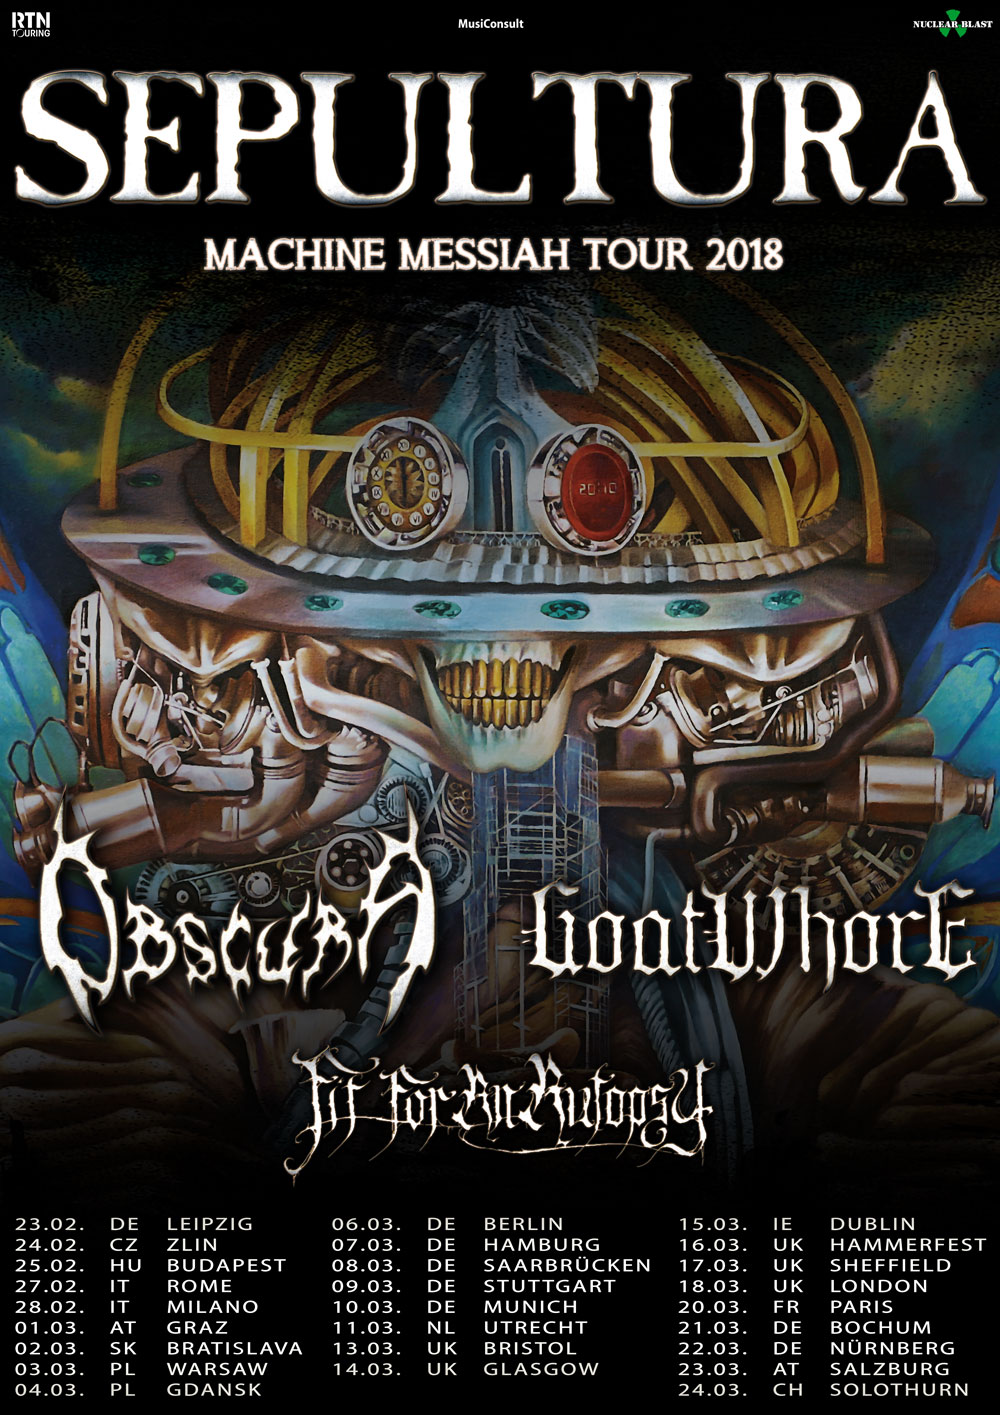 Sepultura Tour 2018